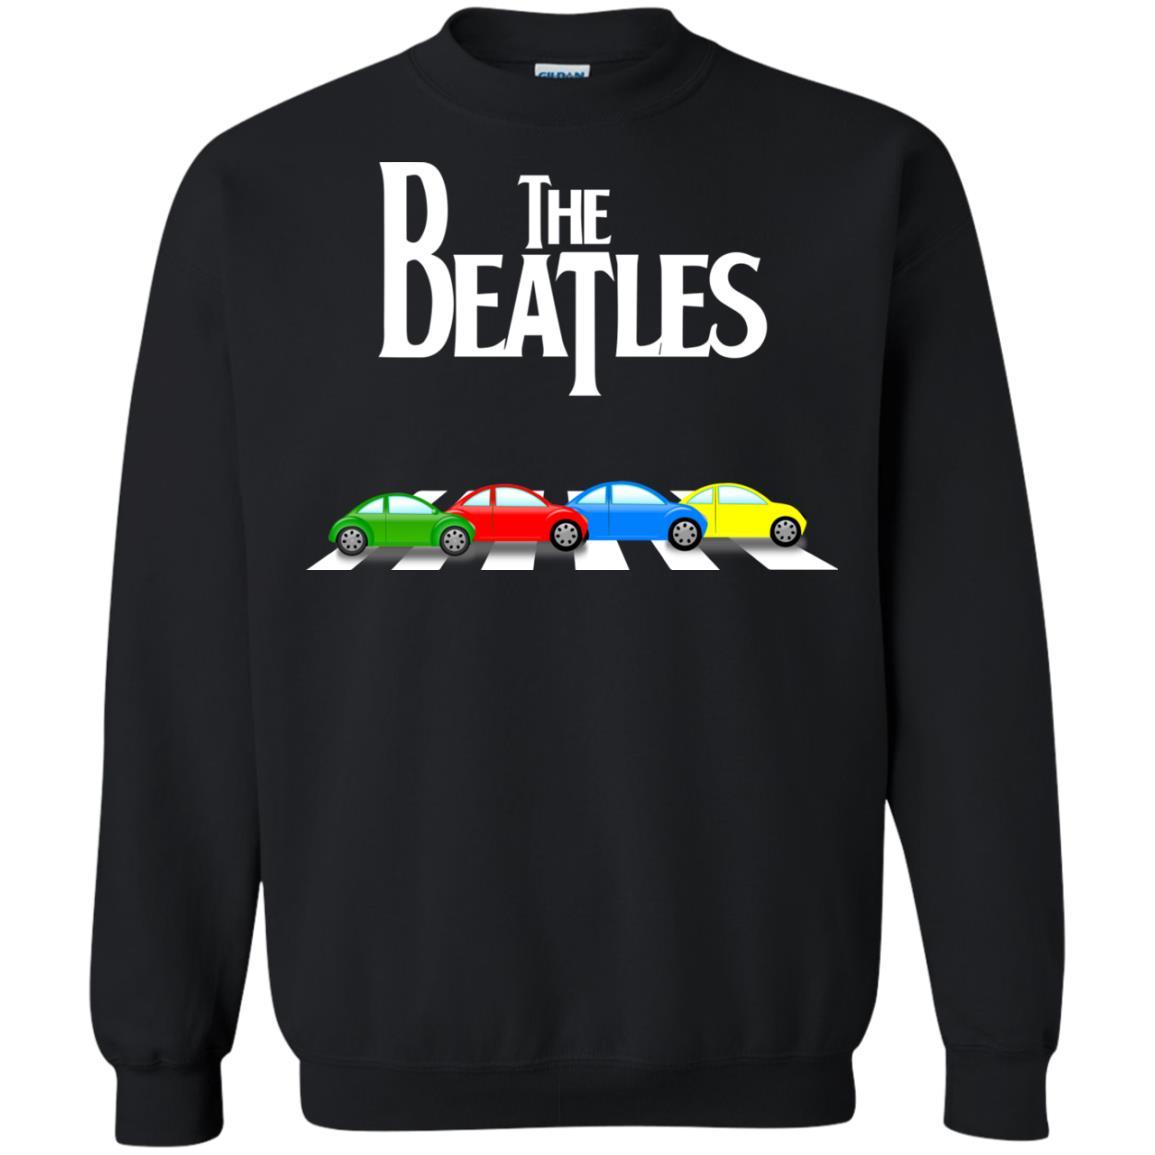 image 332 - The Beatles cars shirt, hoodie, tank